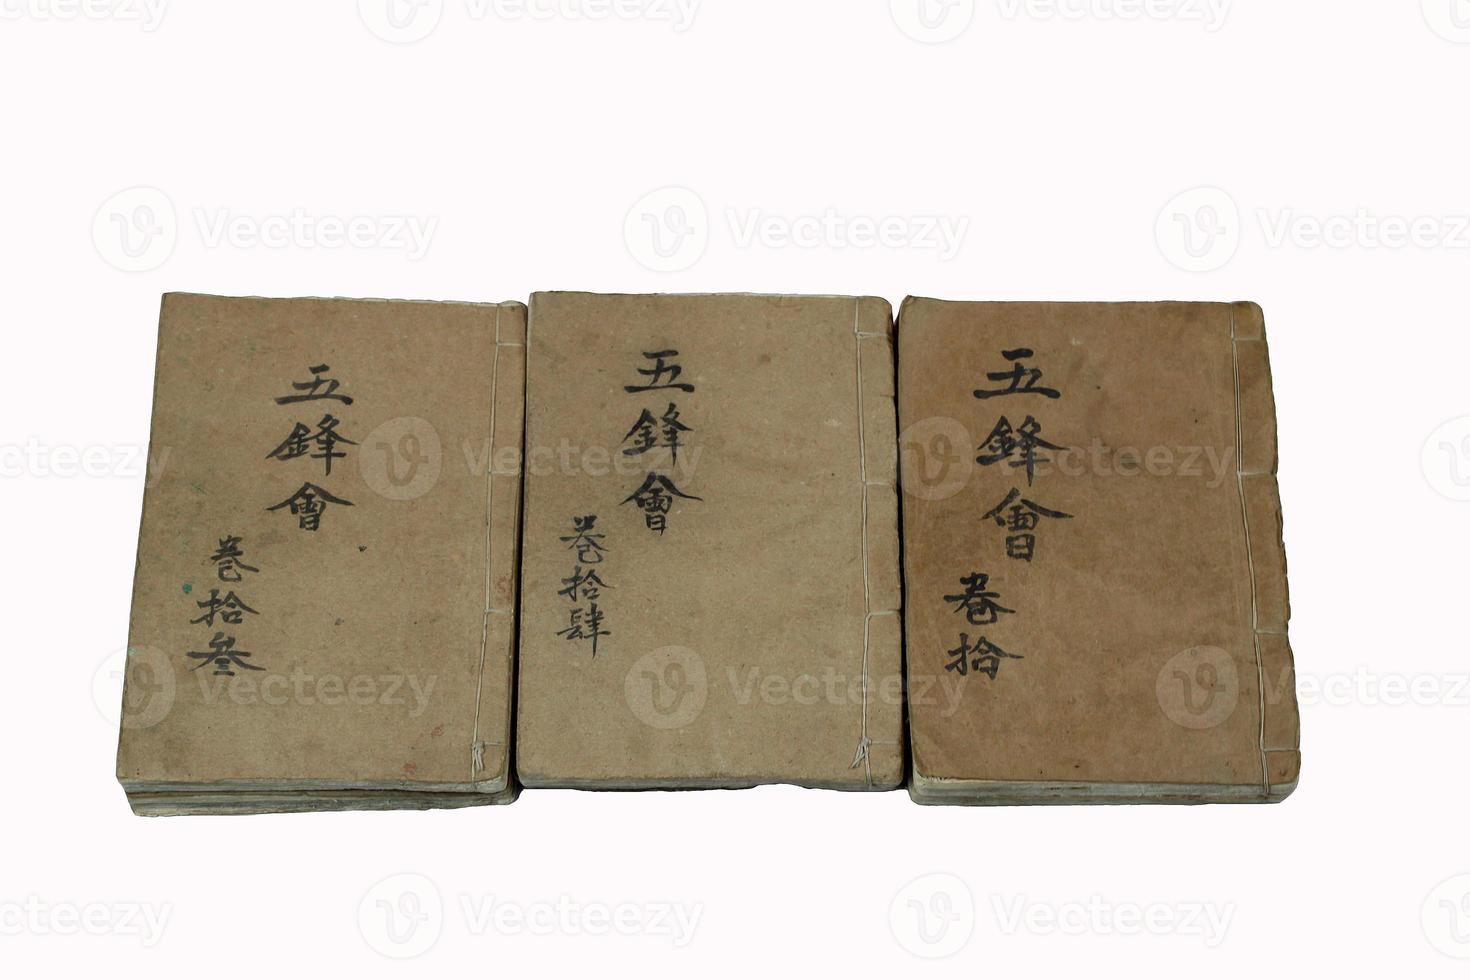 wire-bound books photo